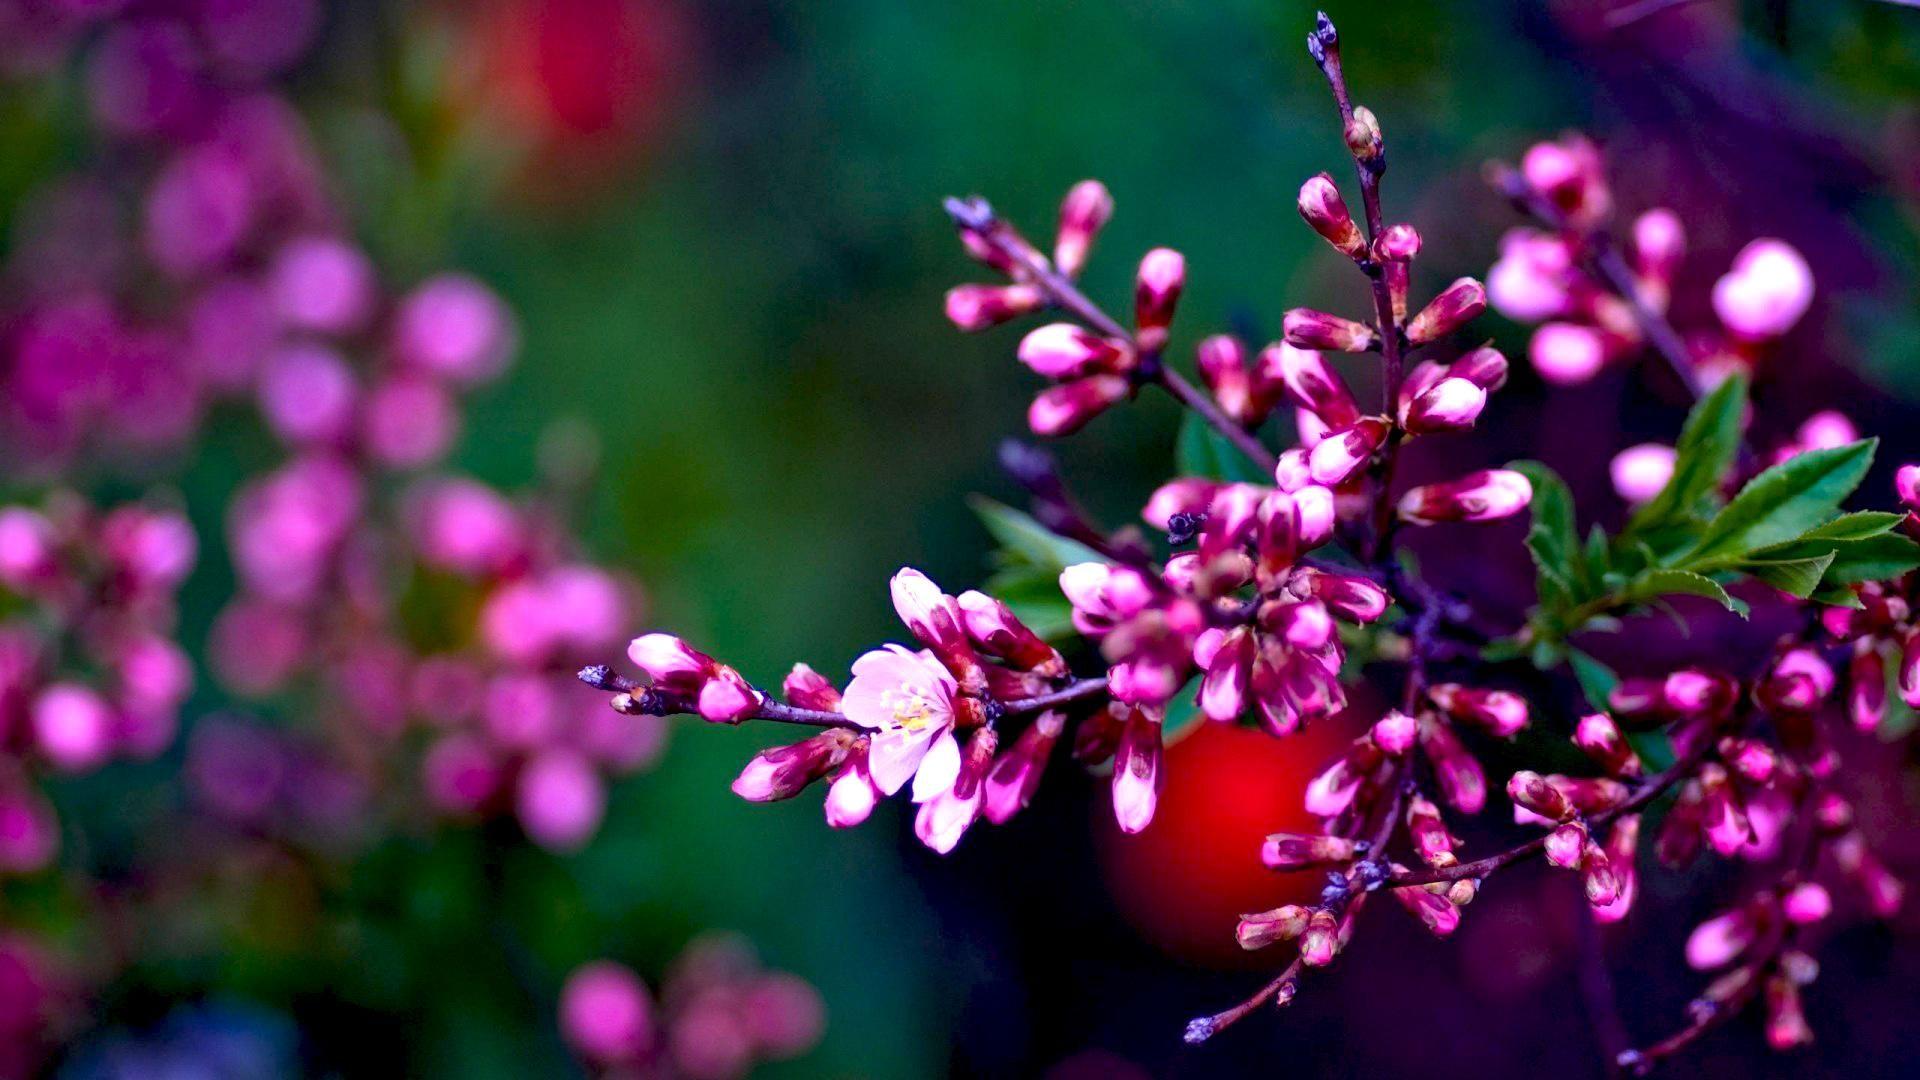 Beautiful Flowers 19201080 Hd Wallpaper Spring Flowers